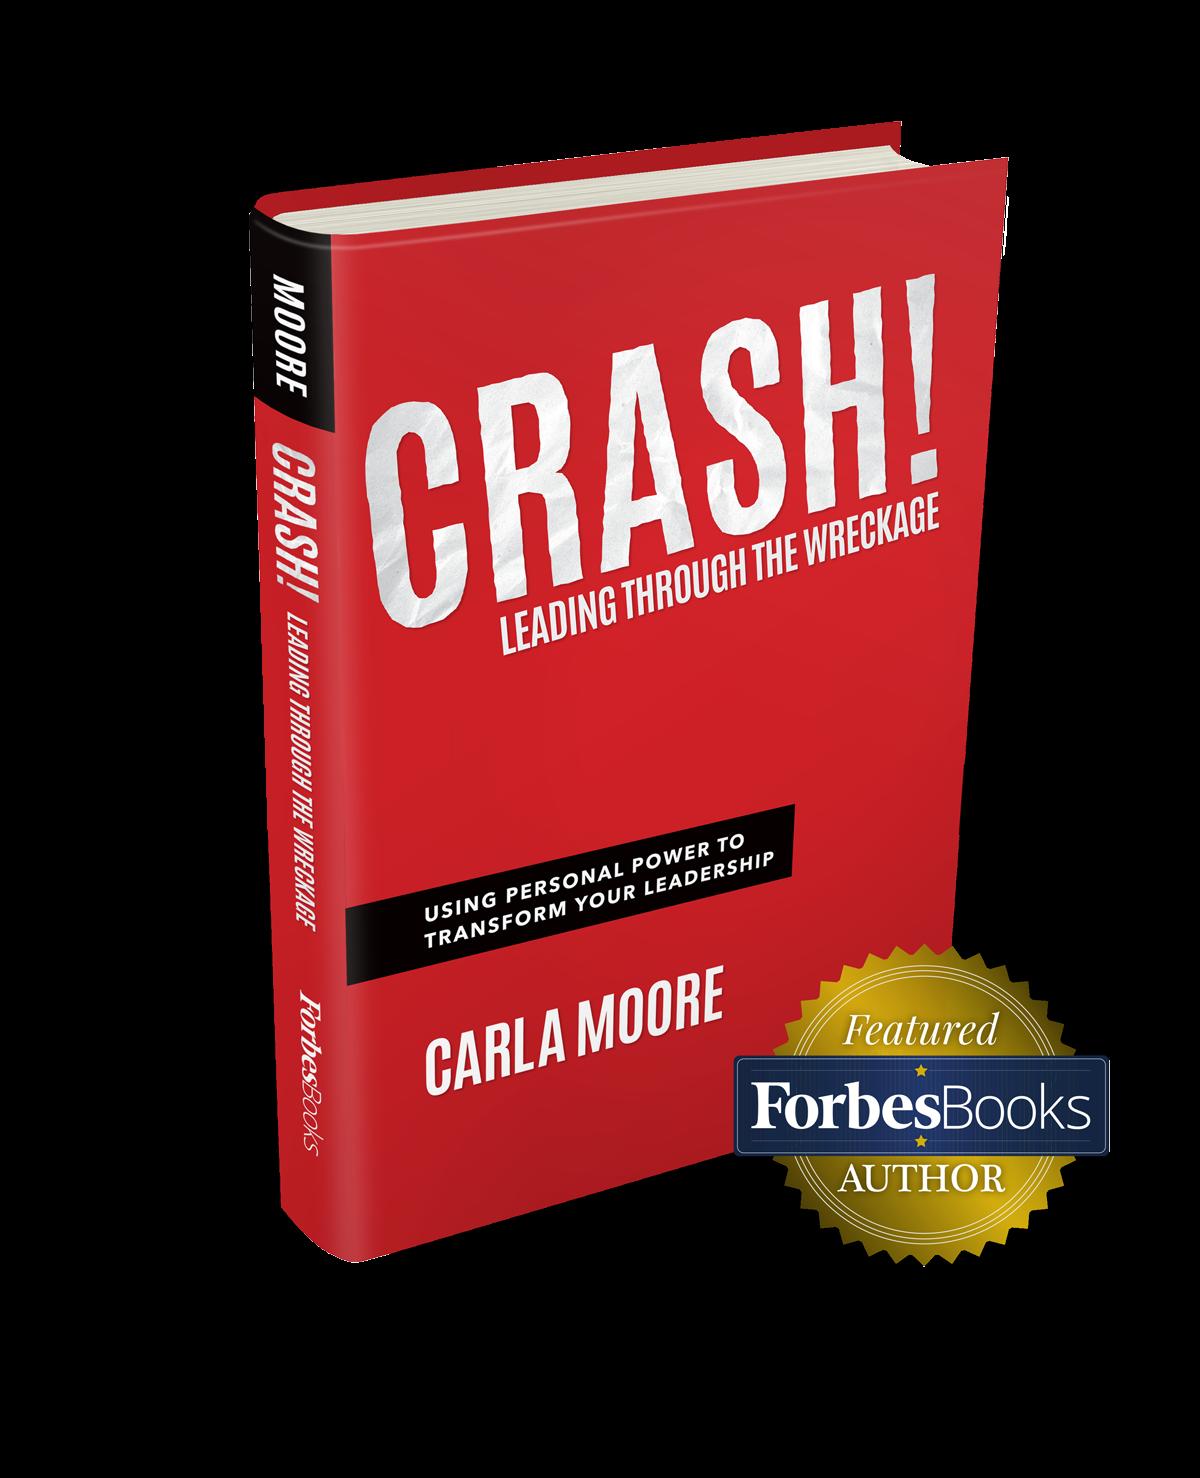 Crash! Leading Through The Wreckage - Book Cover